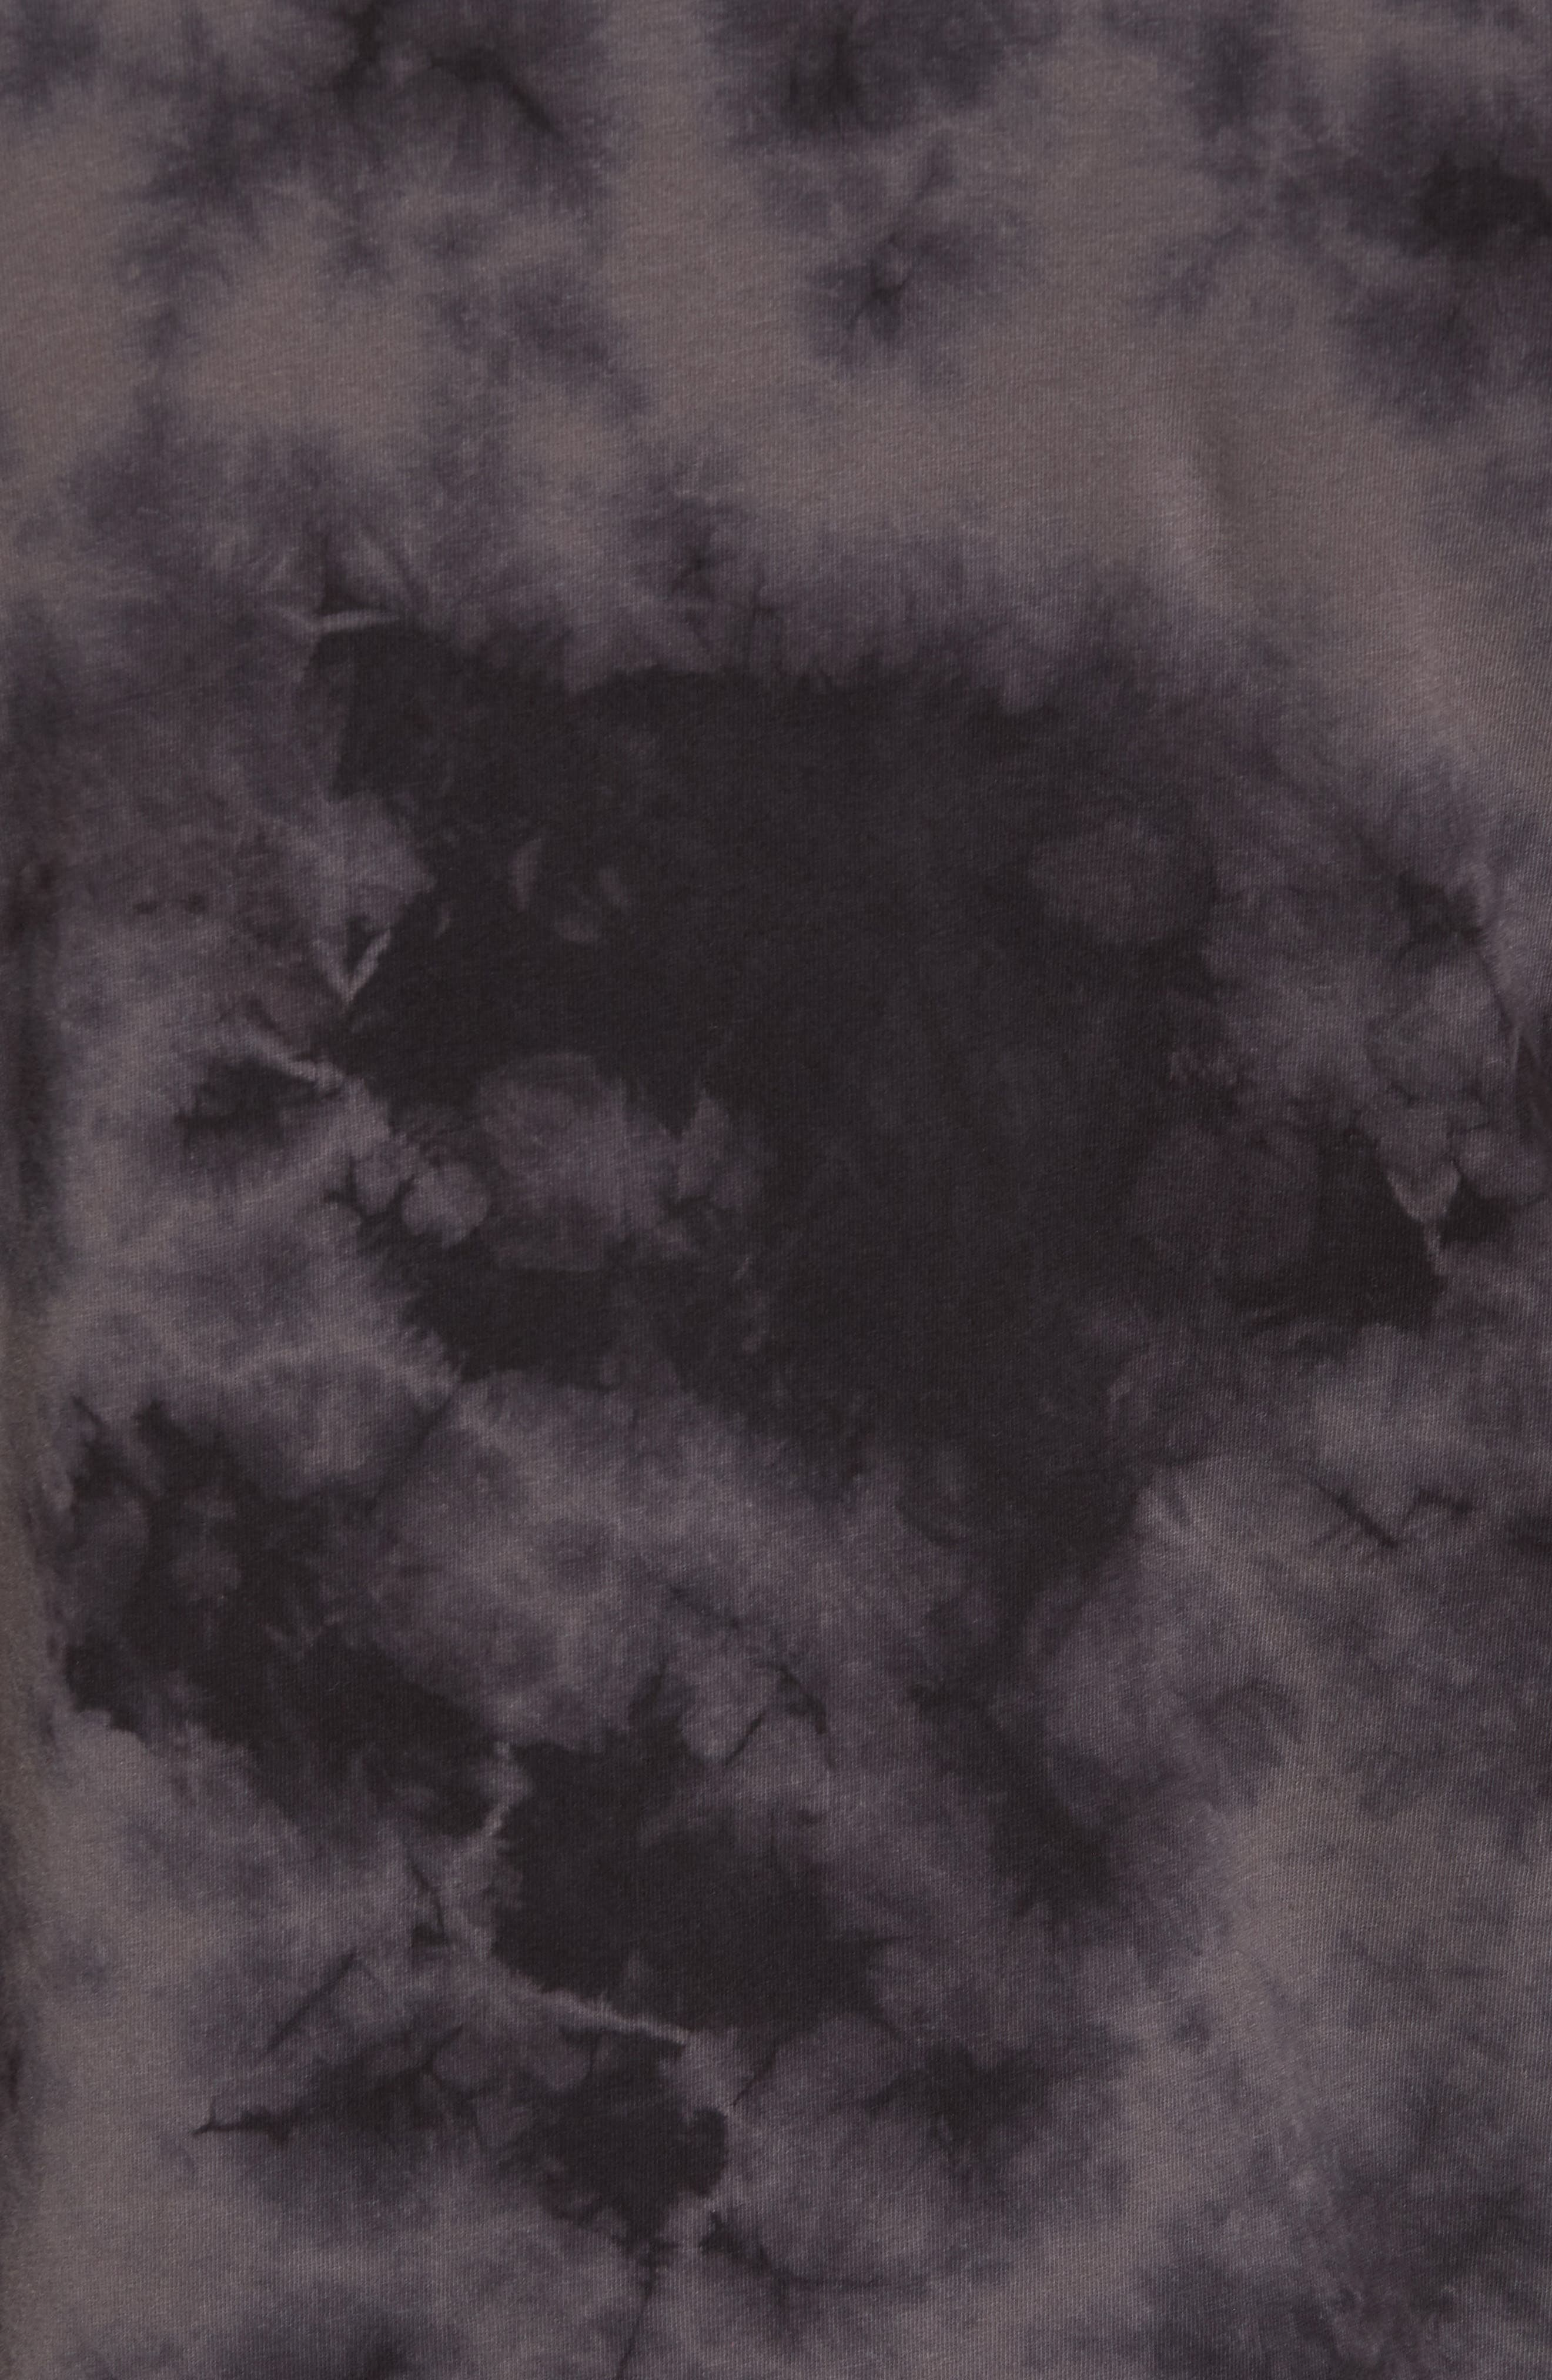 Cult Graphic T-Shirt,                             Alternate thumbnail 5, color,                             Black Wash